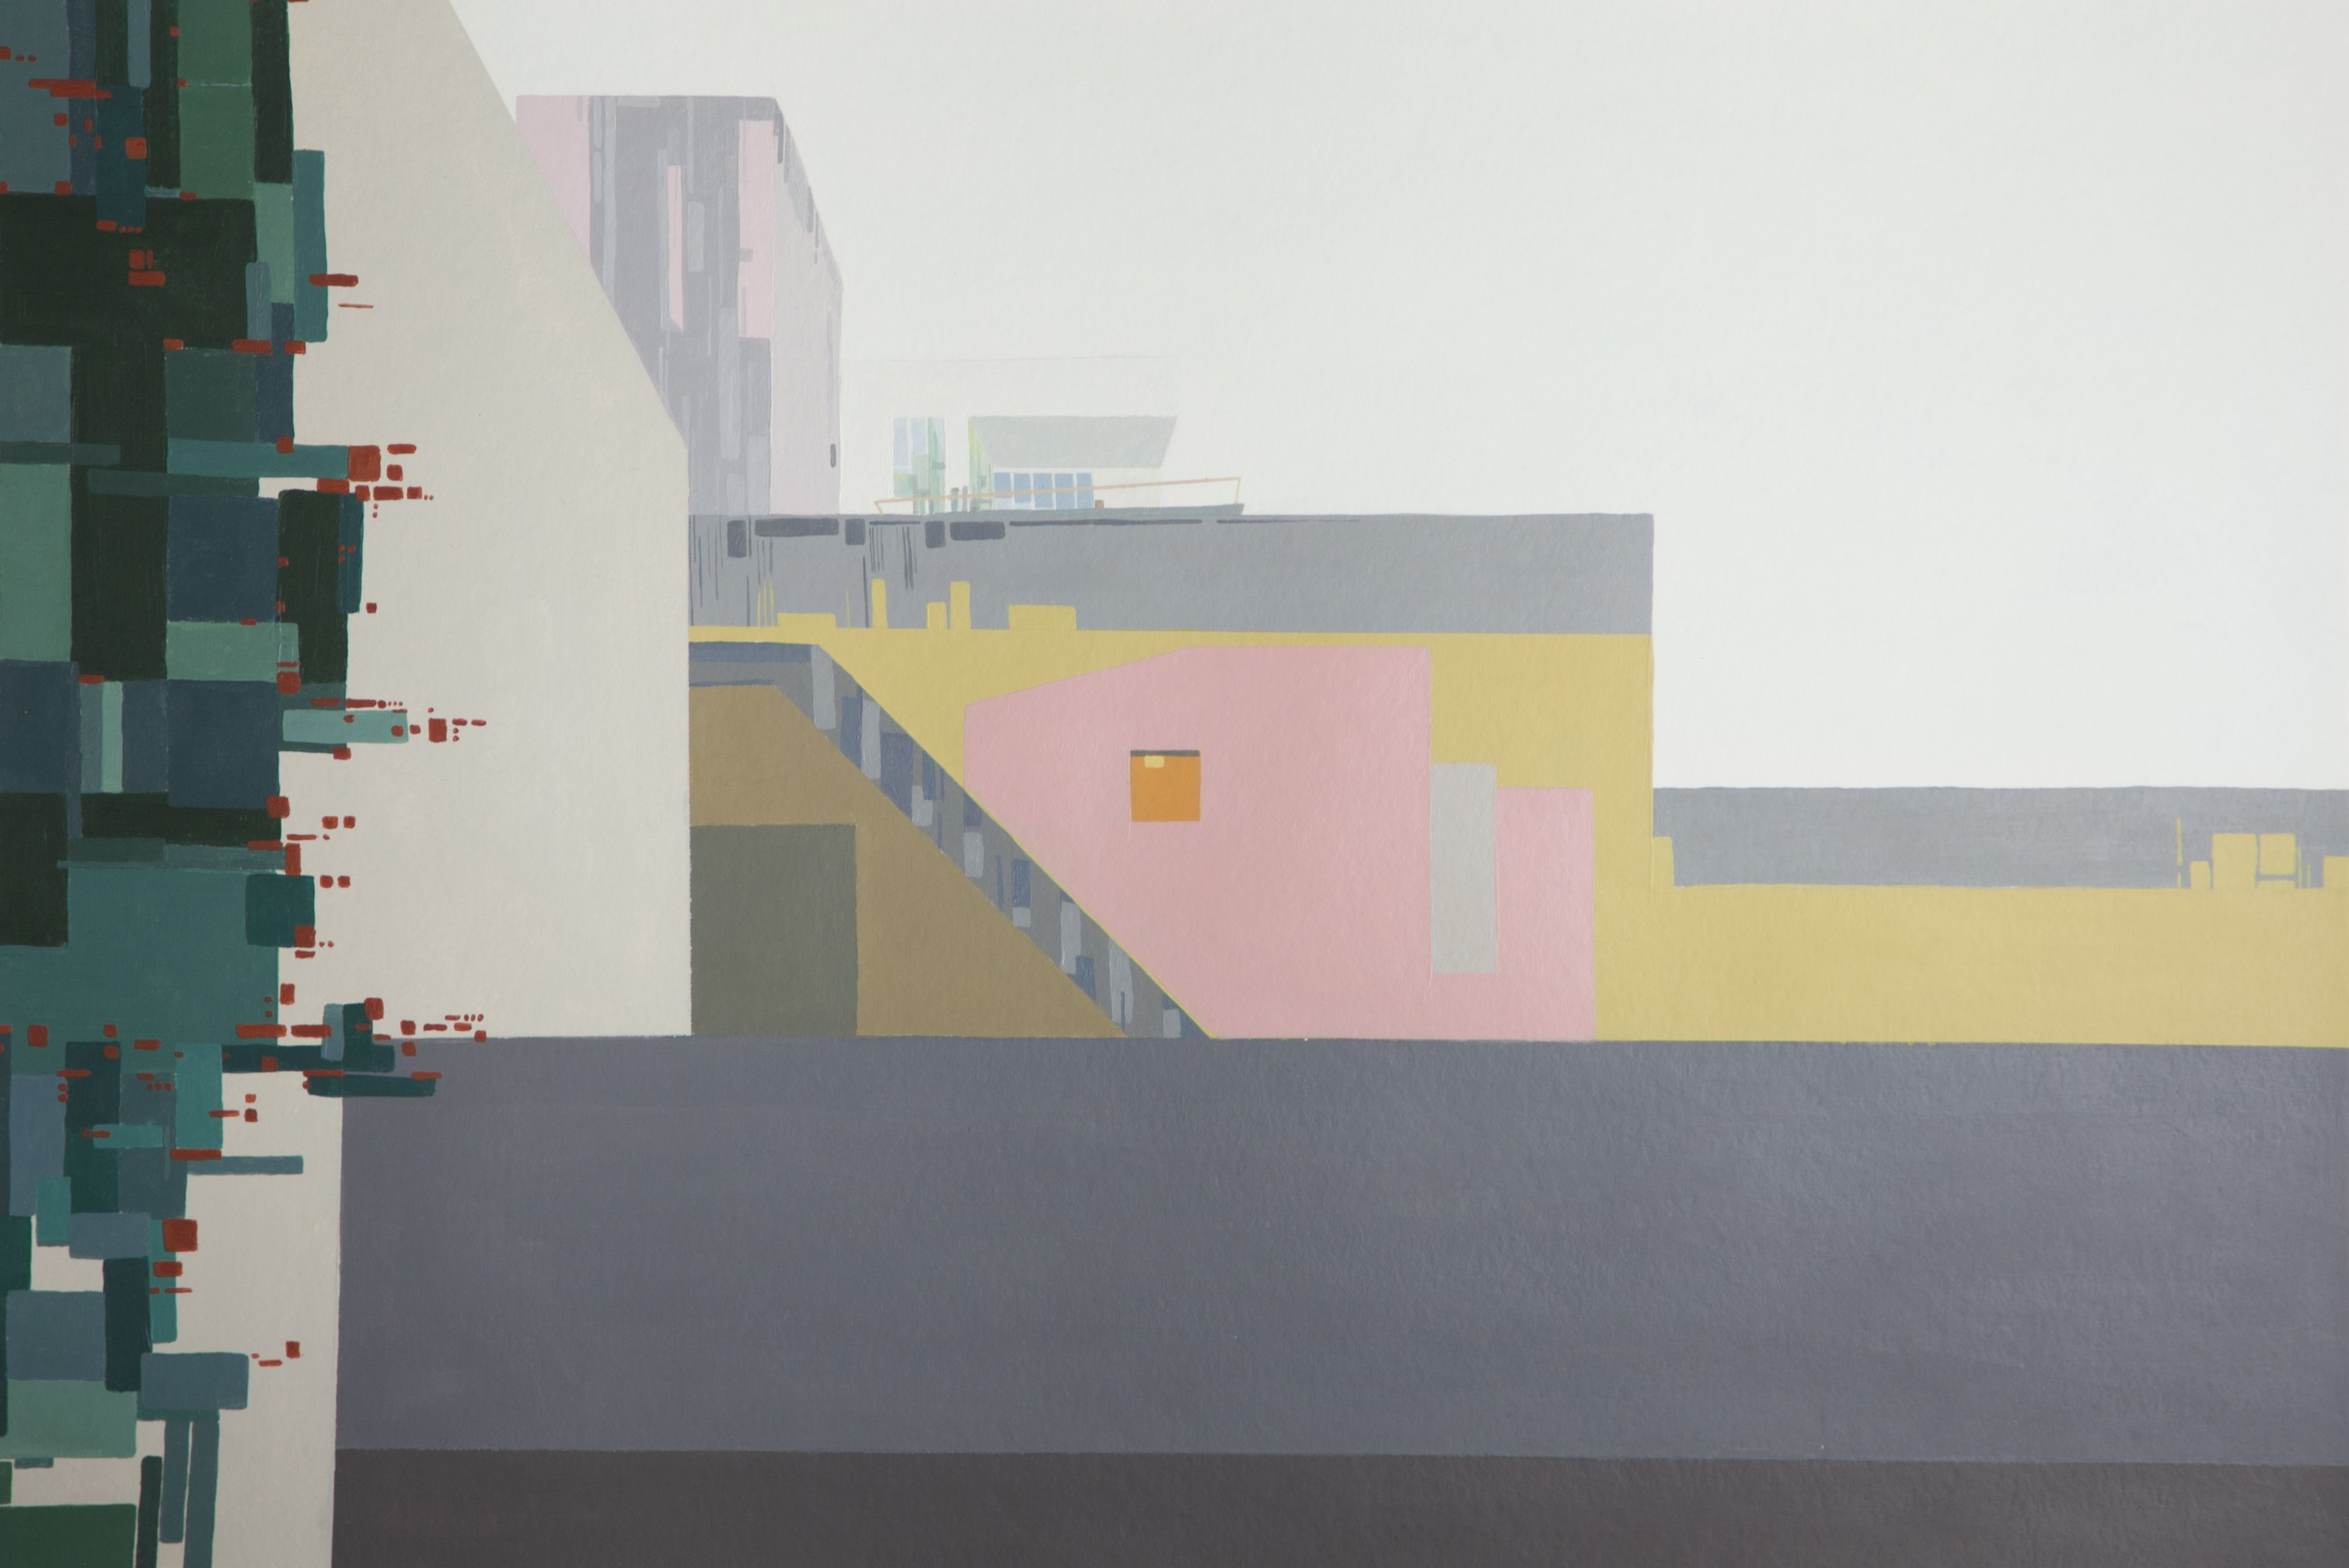 Casa Ortega Acrylique sur papier 58 x 36 cm Morgane Verdonck